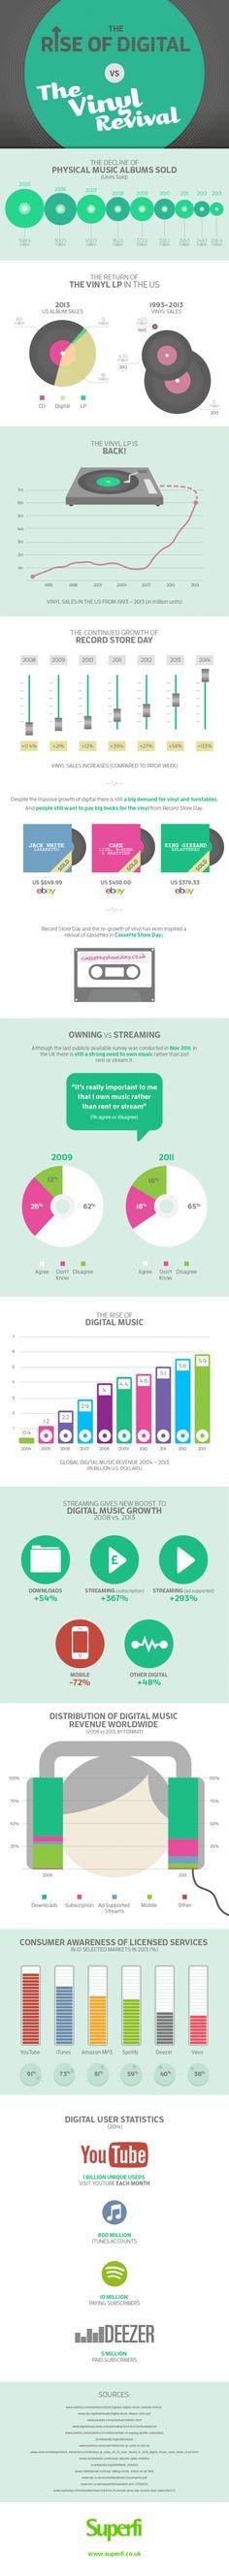 Music Production Evolution: The Rise Of Digital Vs. The Vinyl Revival #Infographic